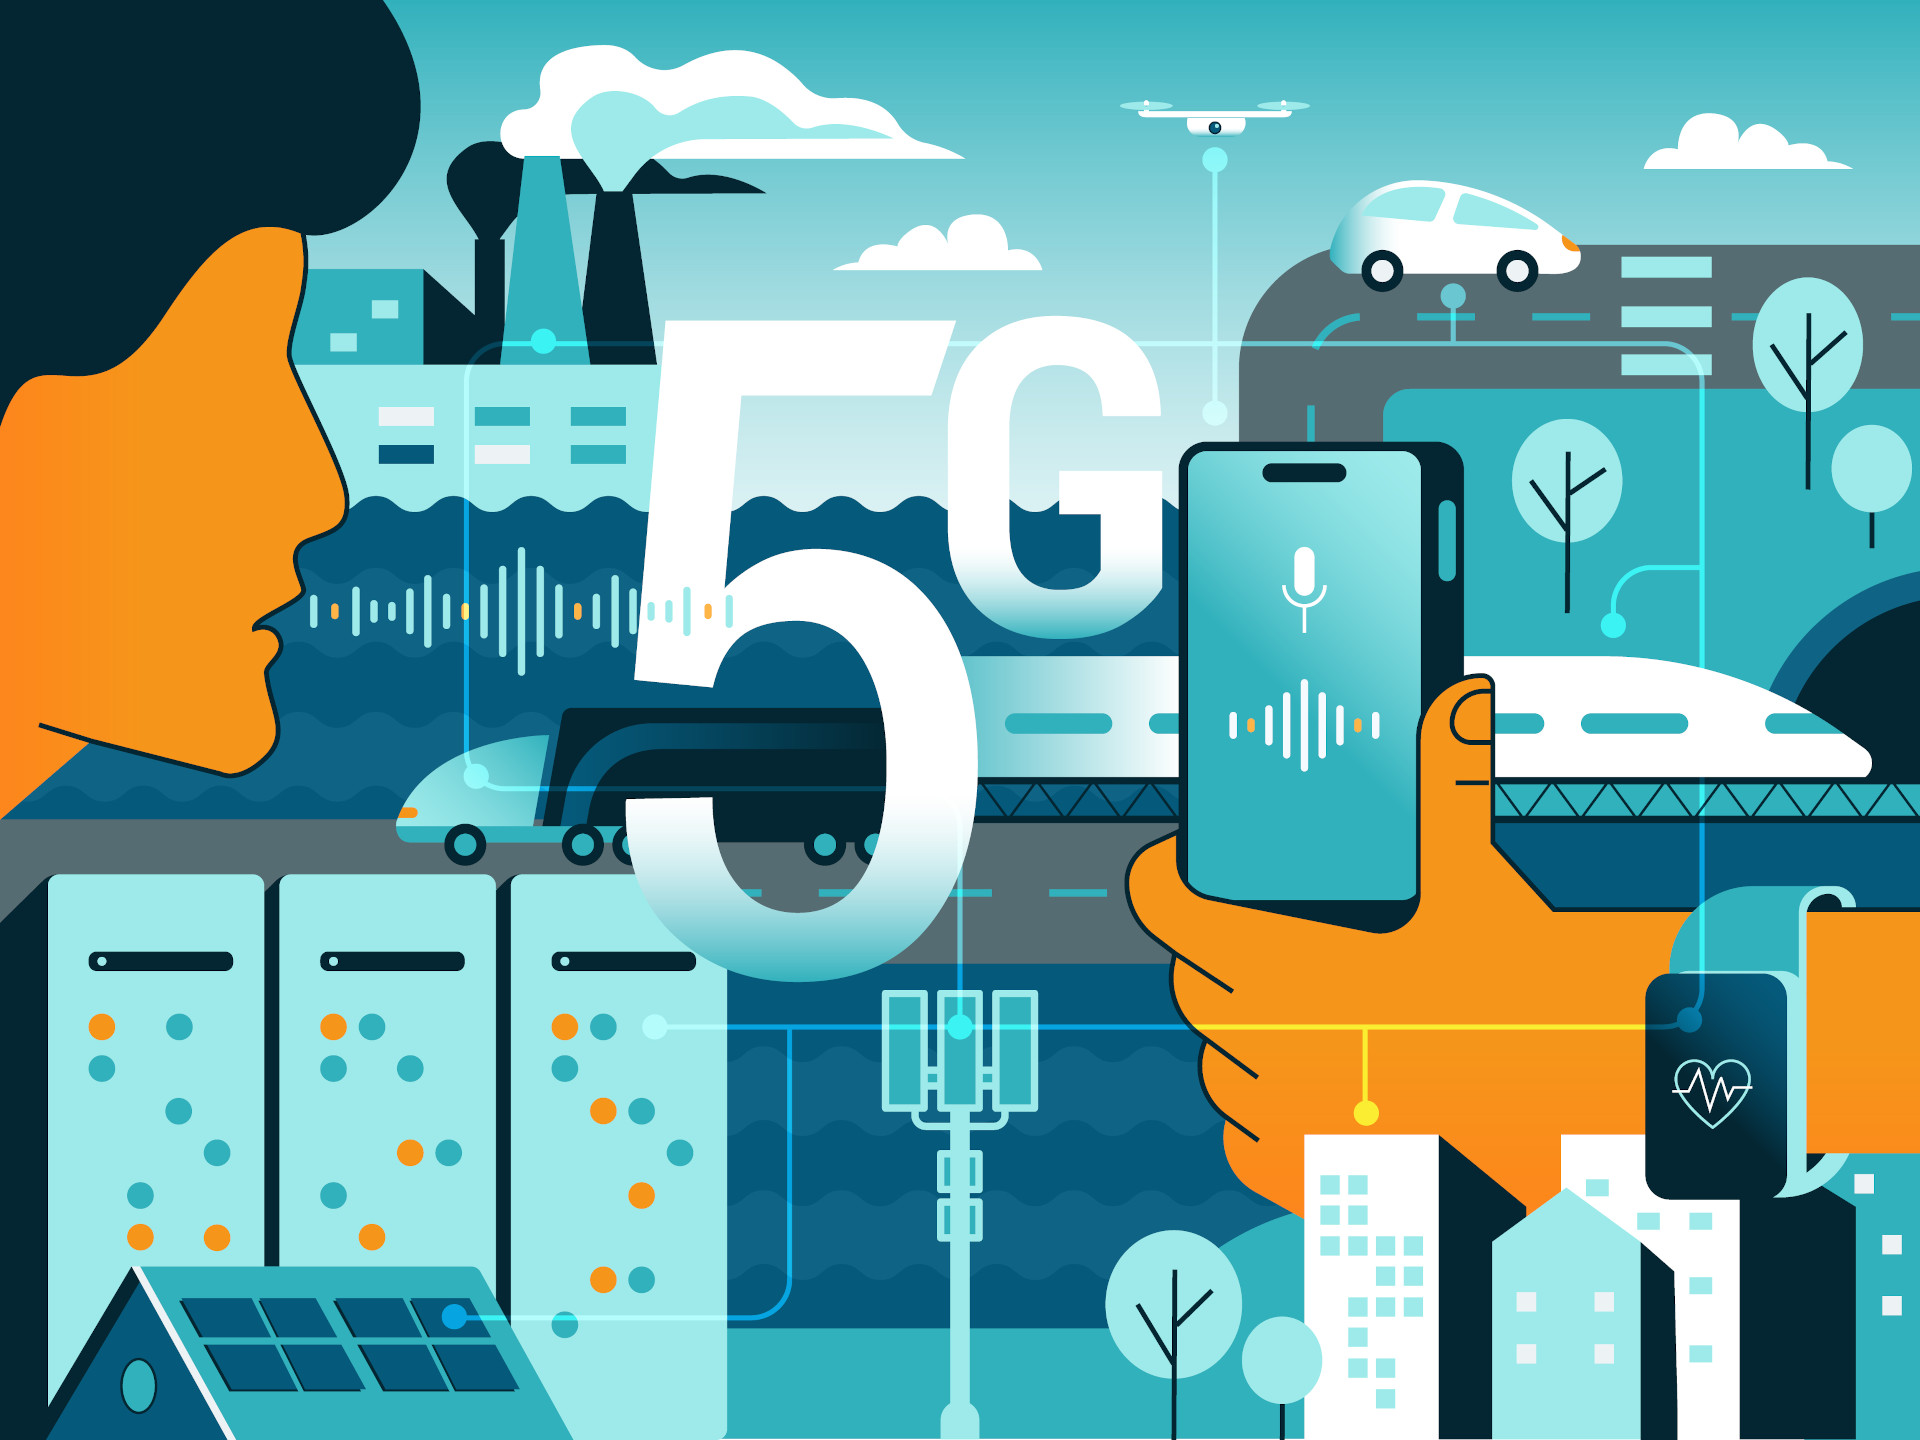 preparing-voice-5g-network-endpoints-blog-banner